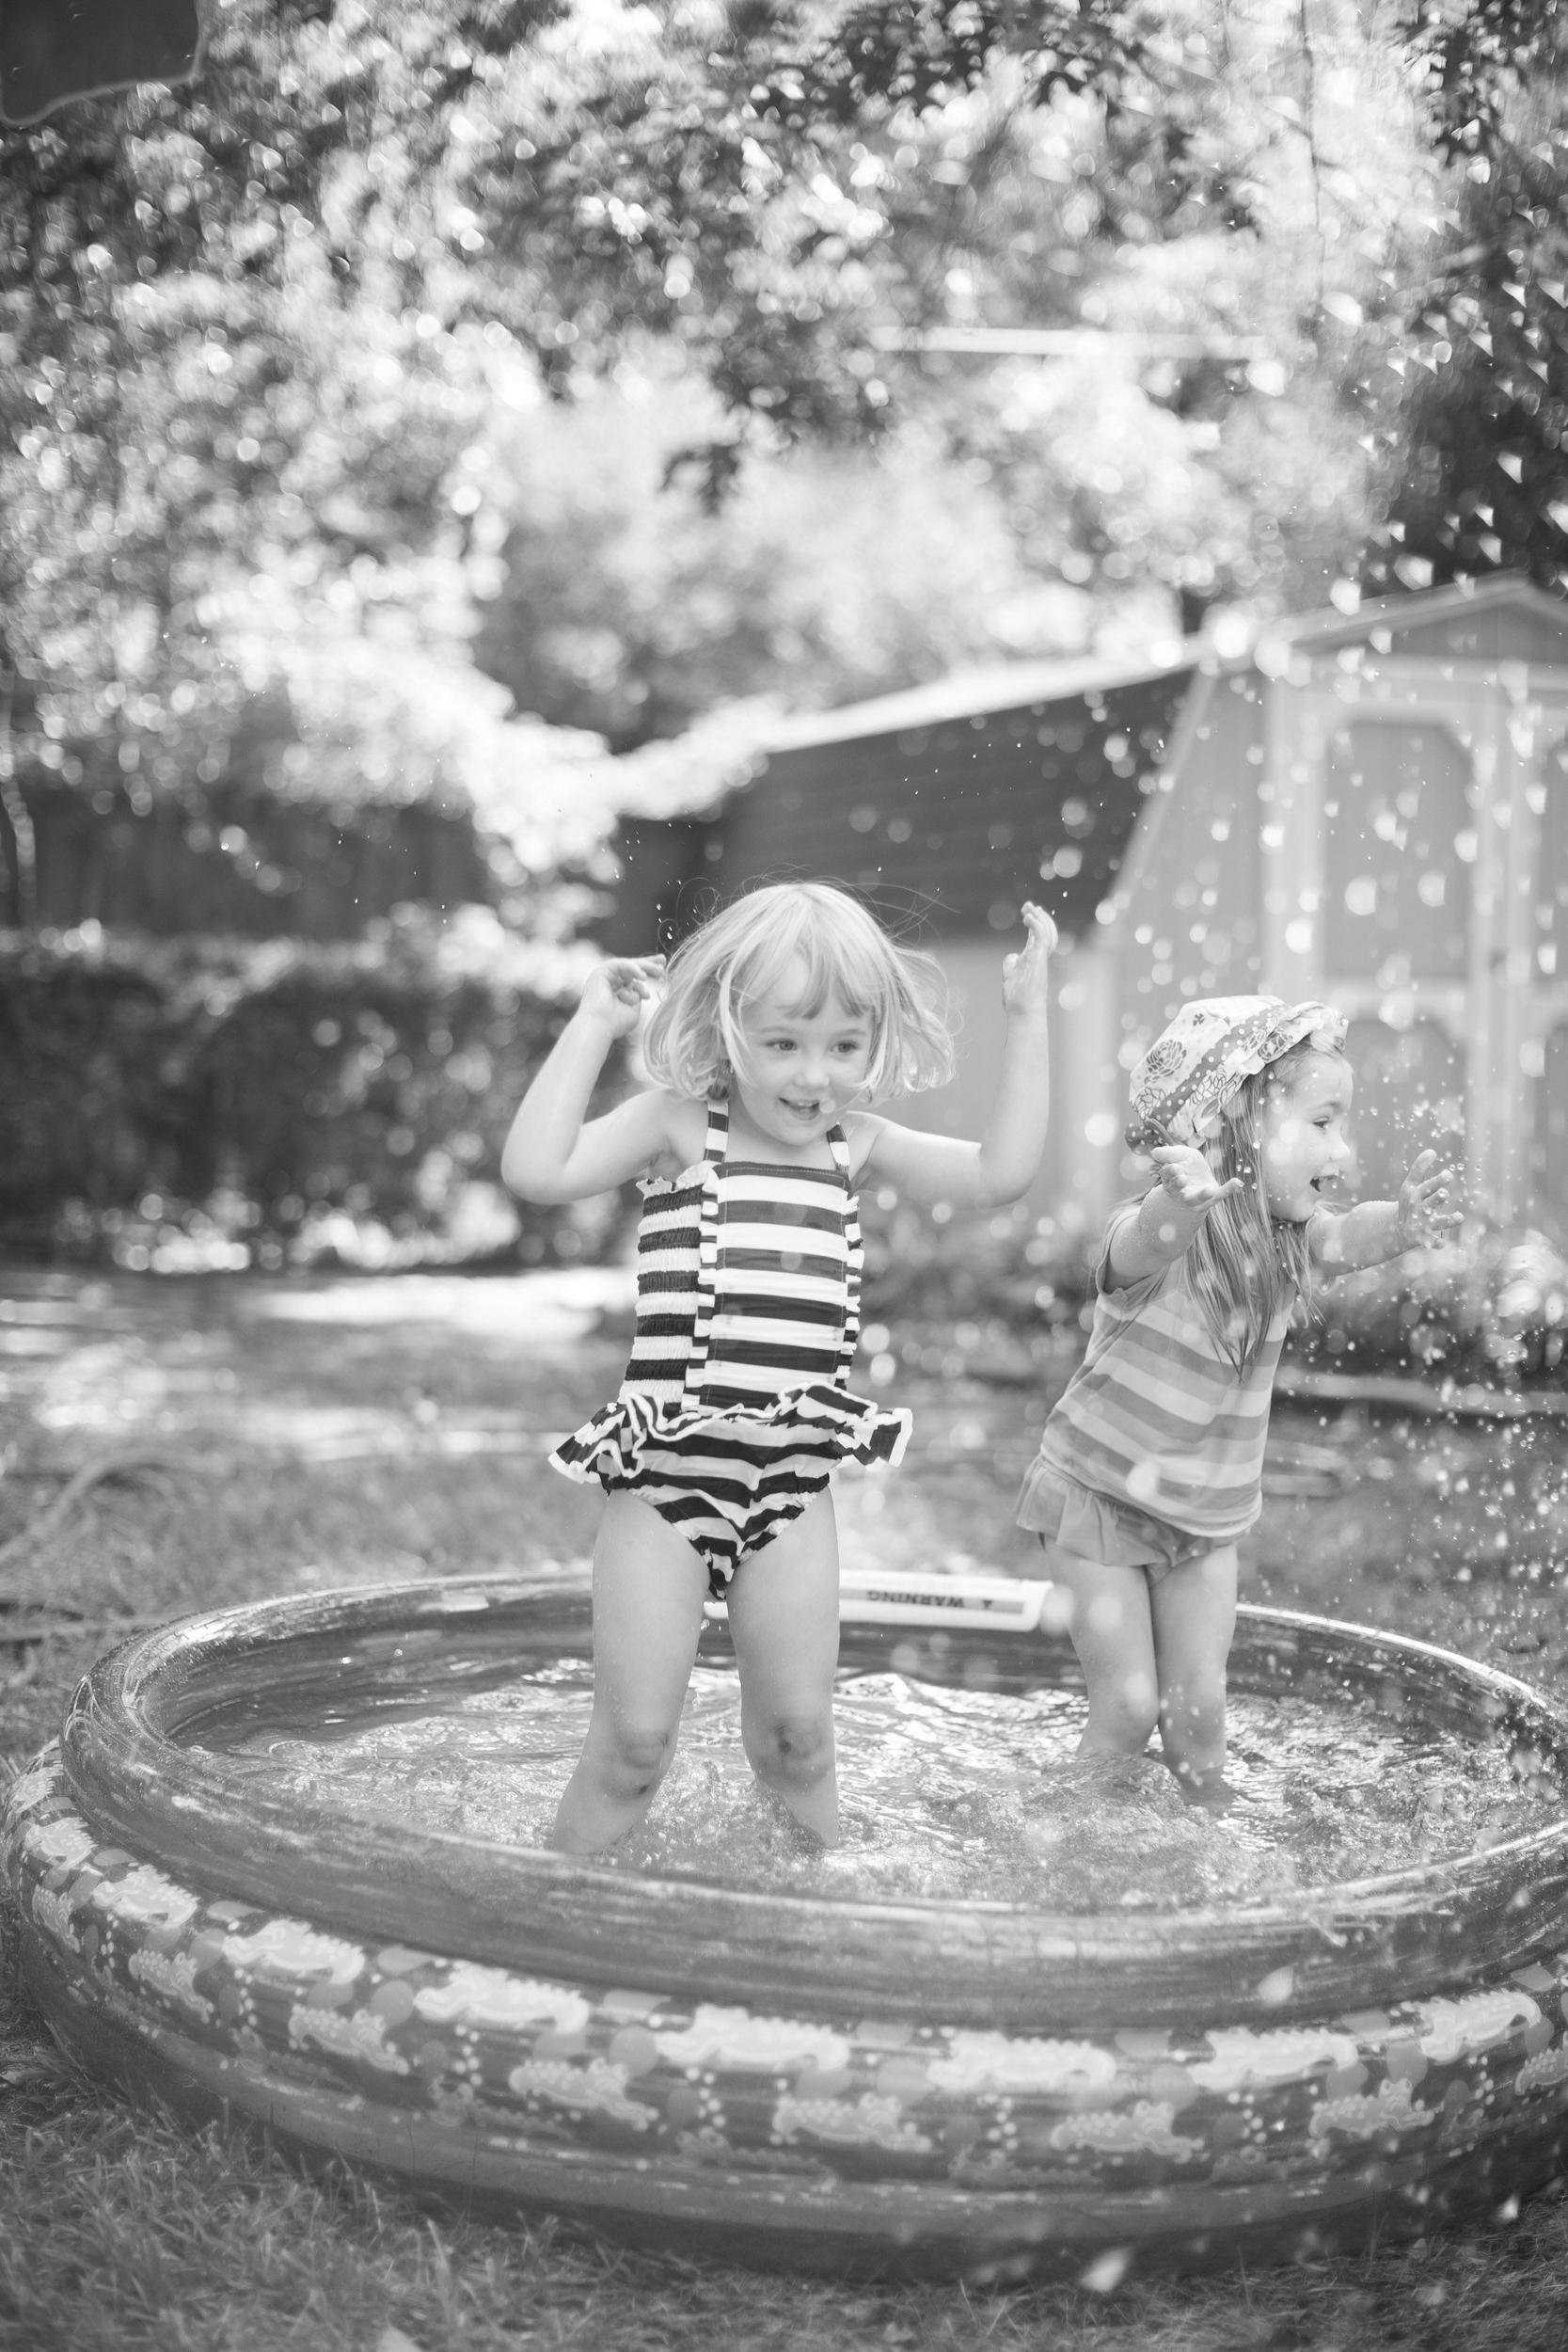 dallas_texas_birthday_party_mae_emily_clarke_events_kids_retro_pool_swim_endless_summer_invitations_ceci_new_york_watercolor_illustration_decor-22.jpg